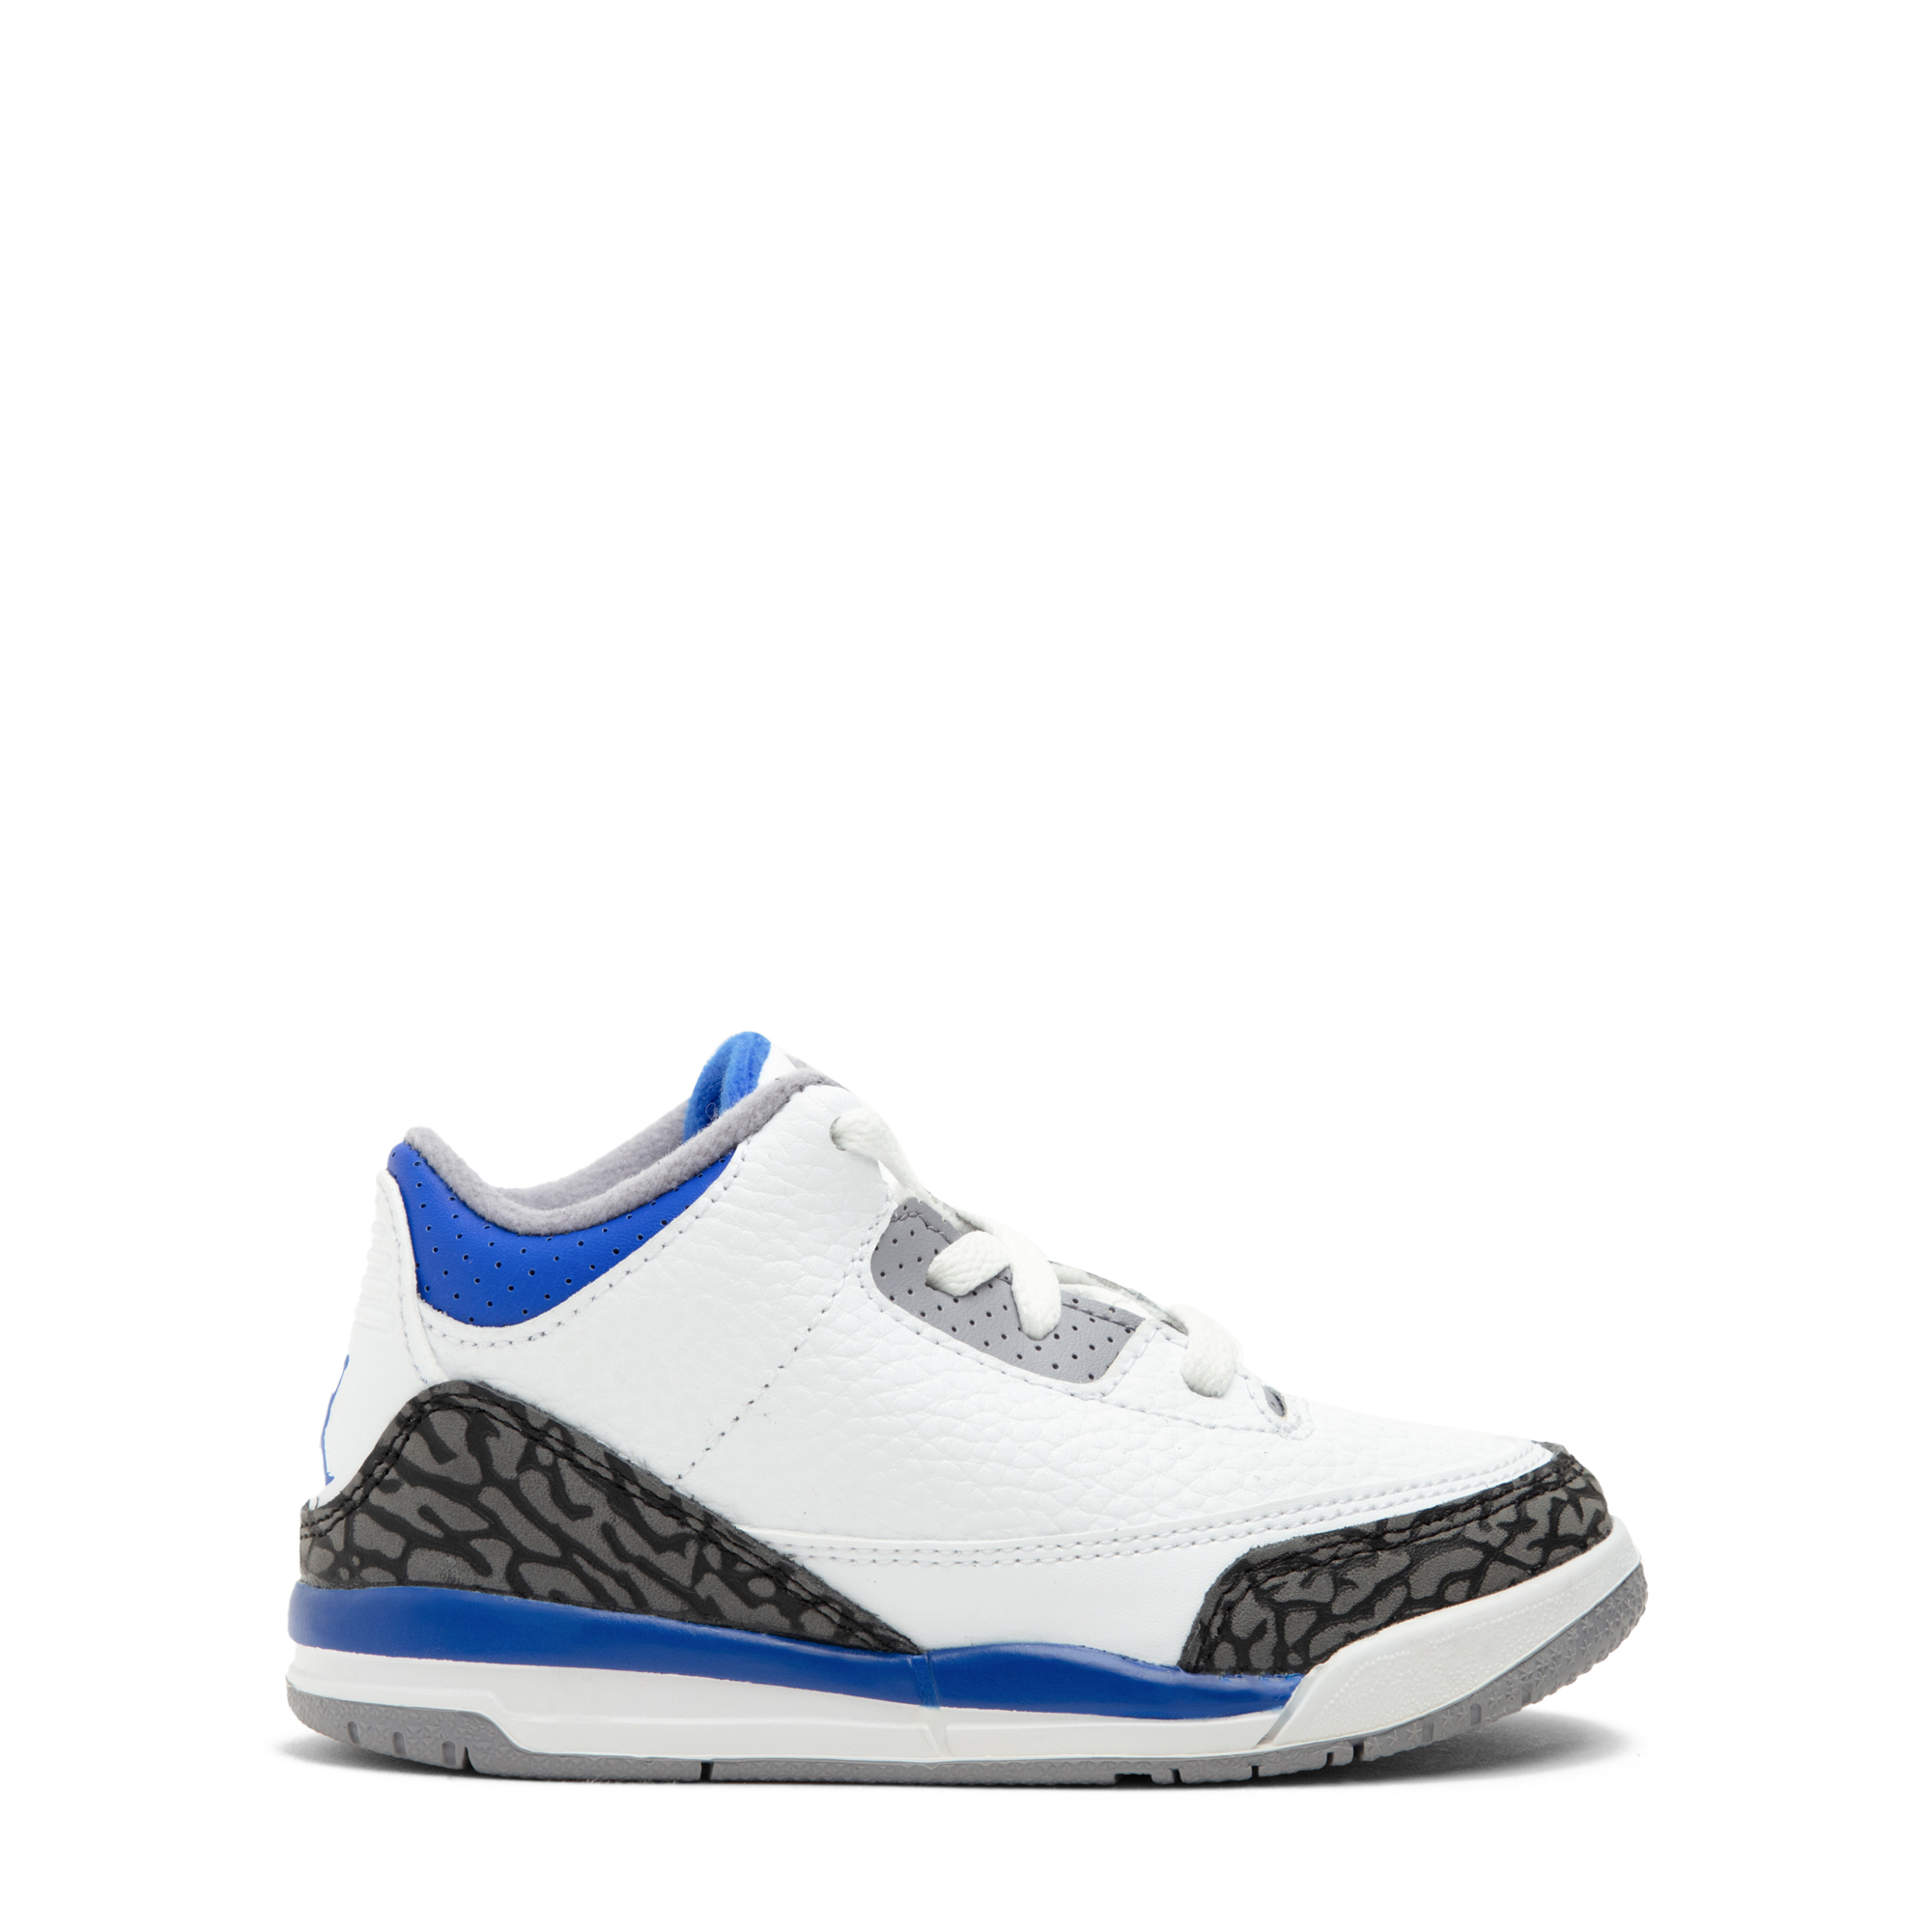 حذاء إير جوردان 3 ريسر بلو الرياضي